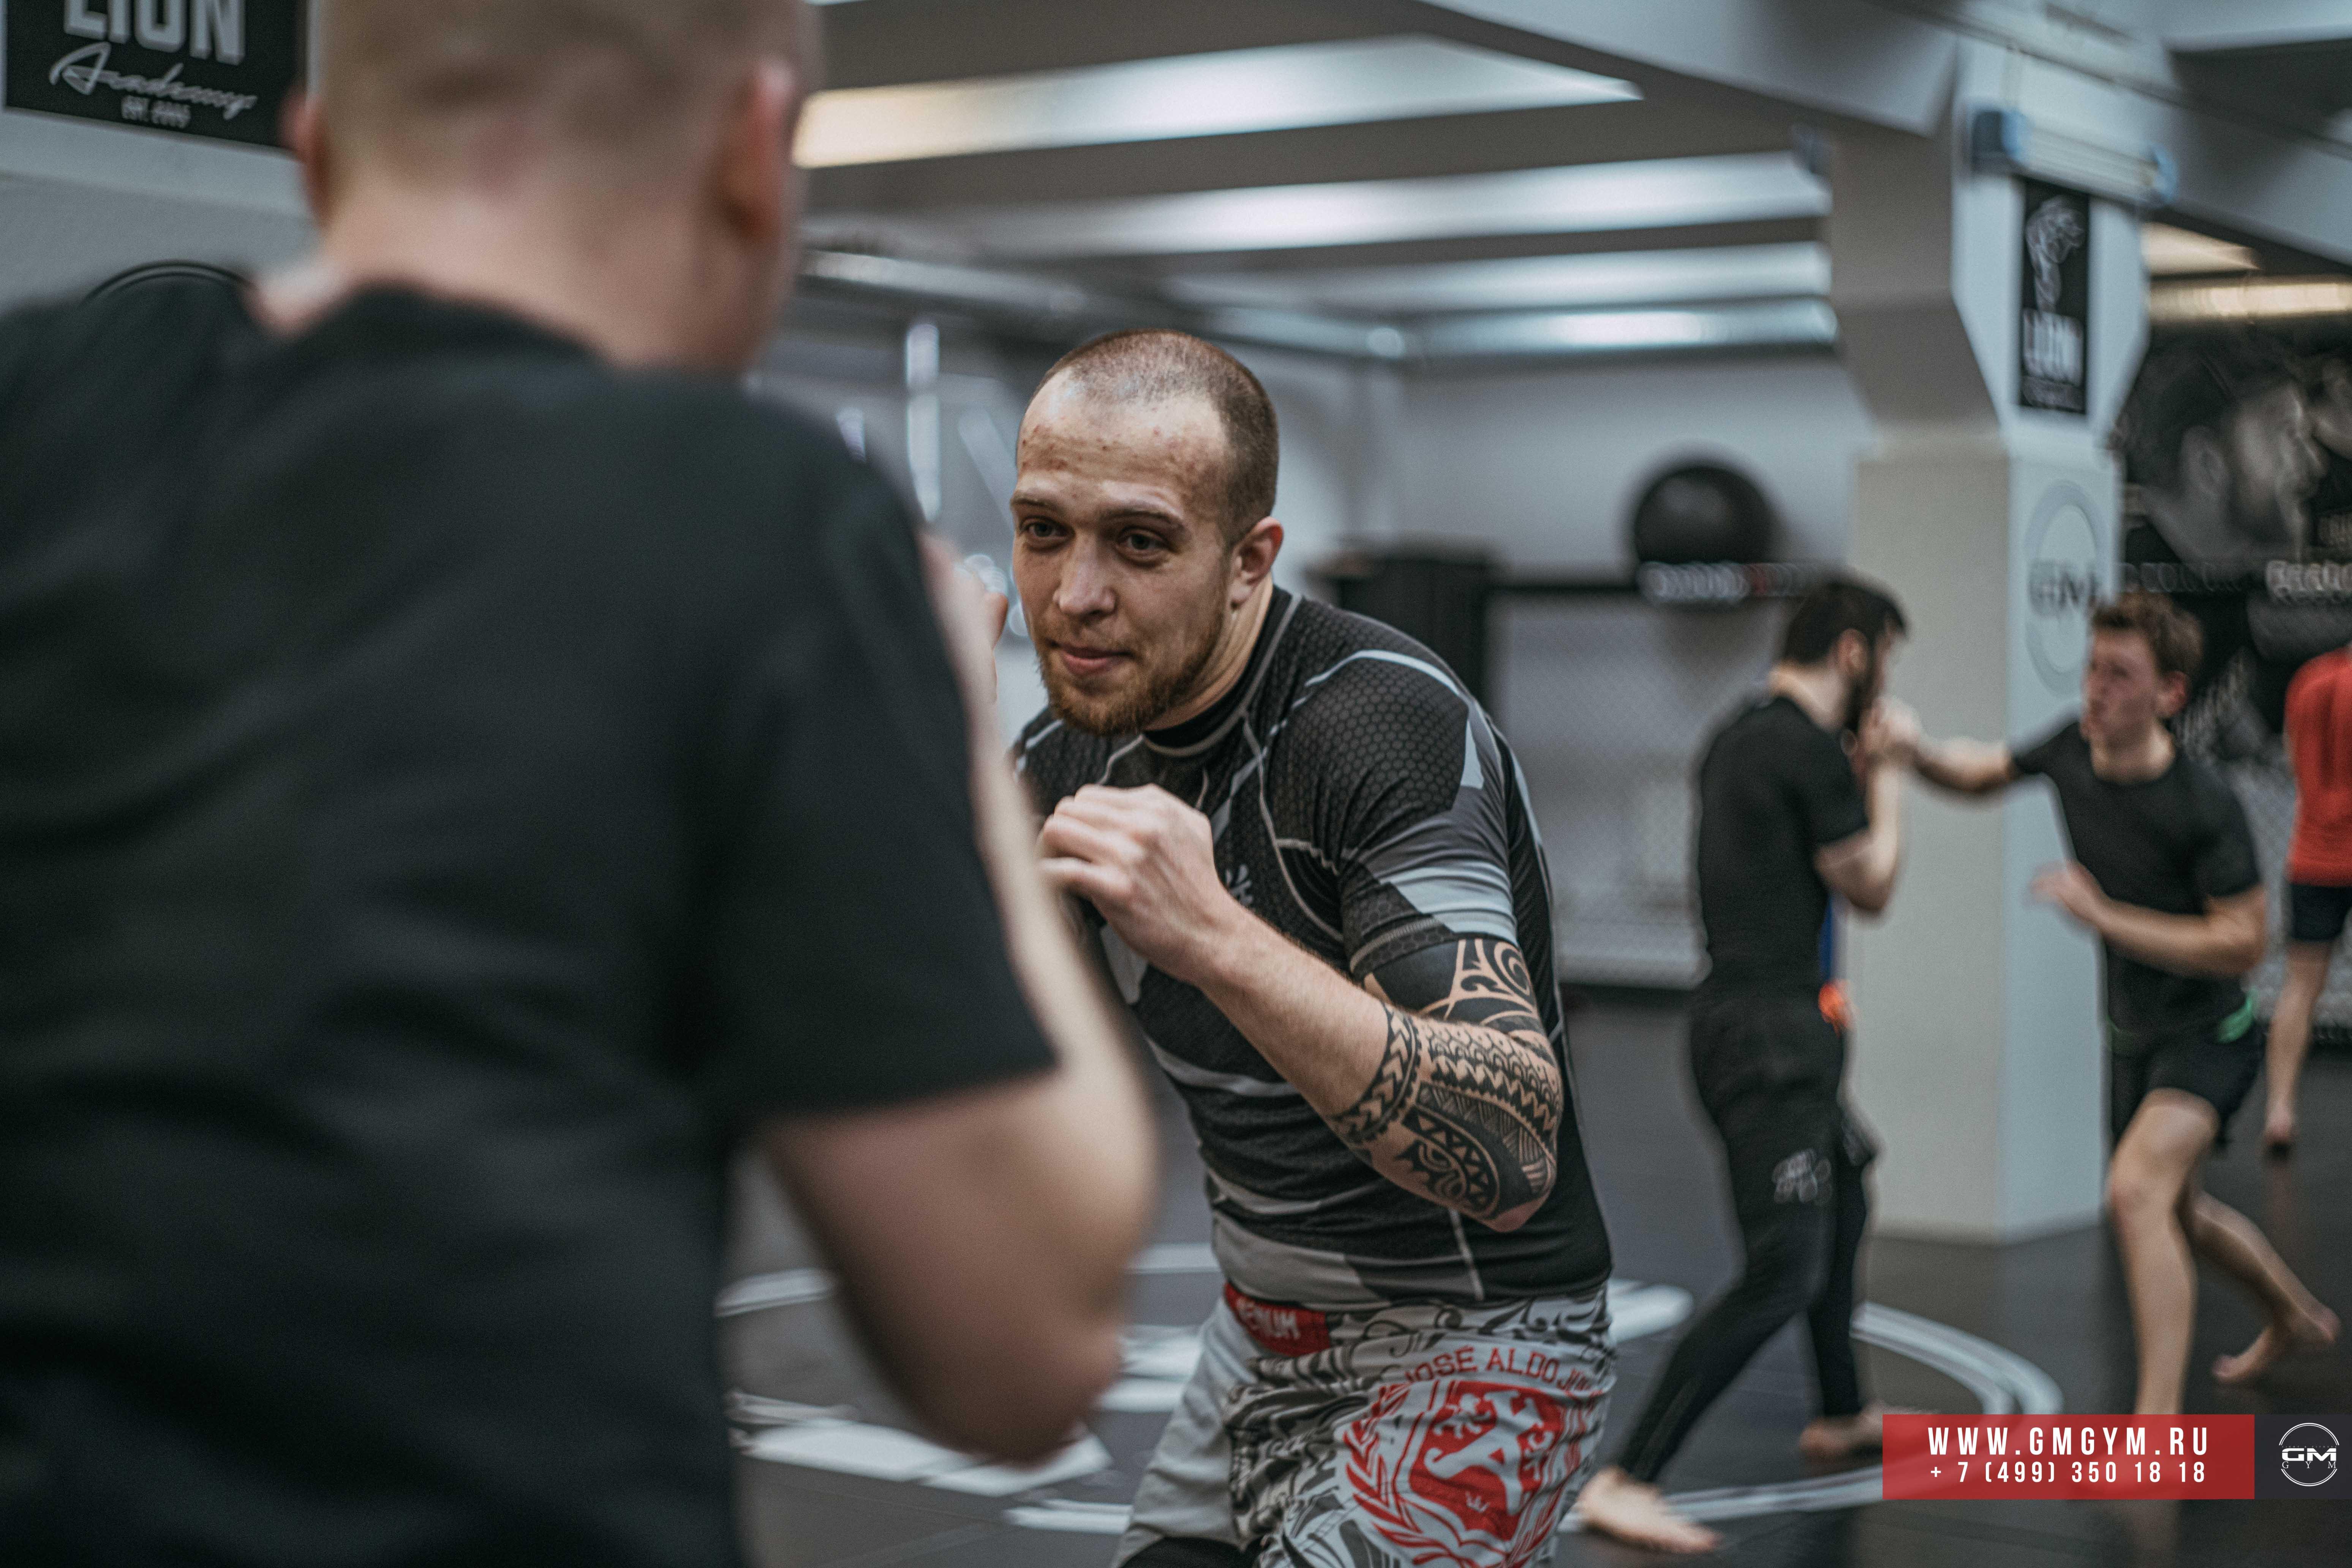 Виталий Слипенко тренер по ММА 4